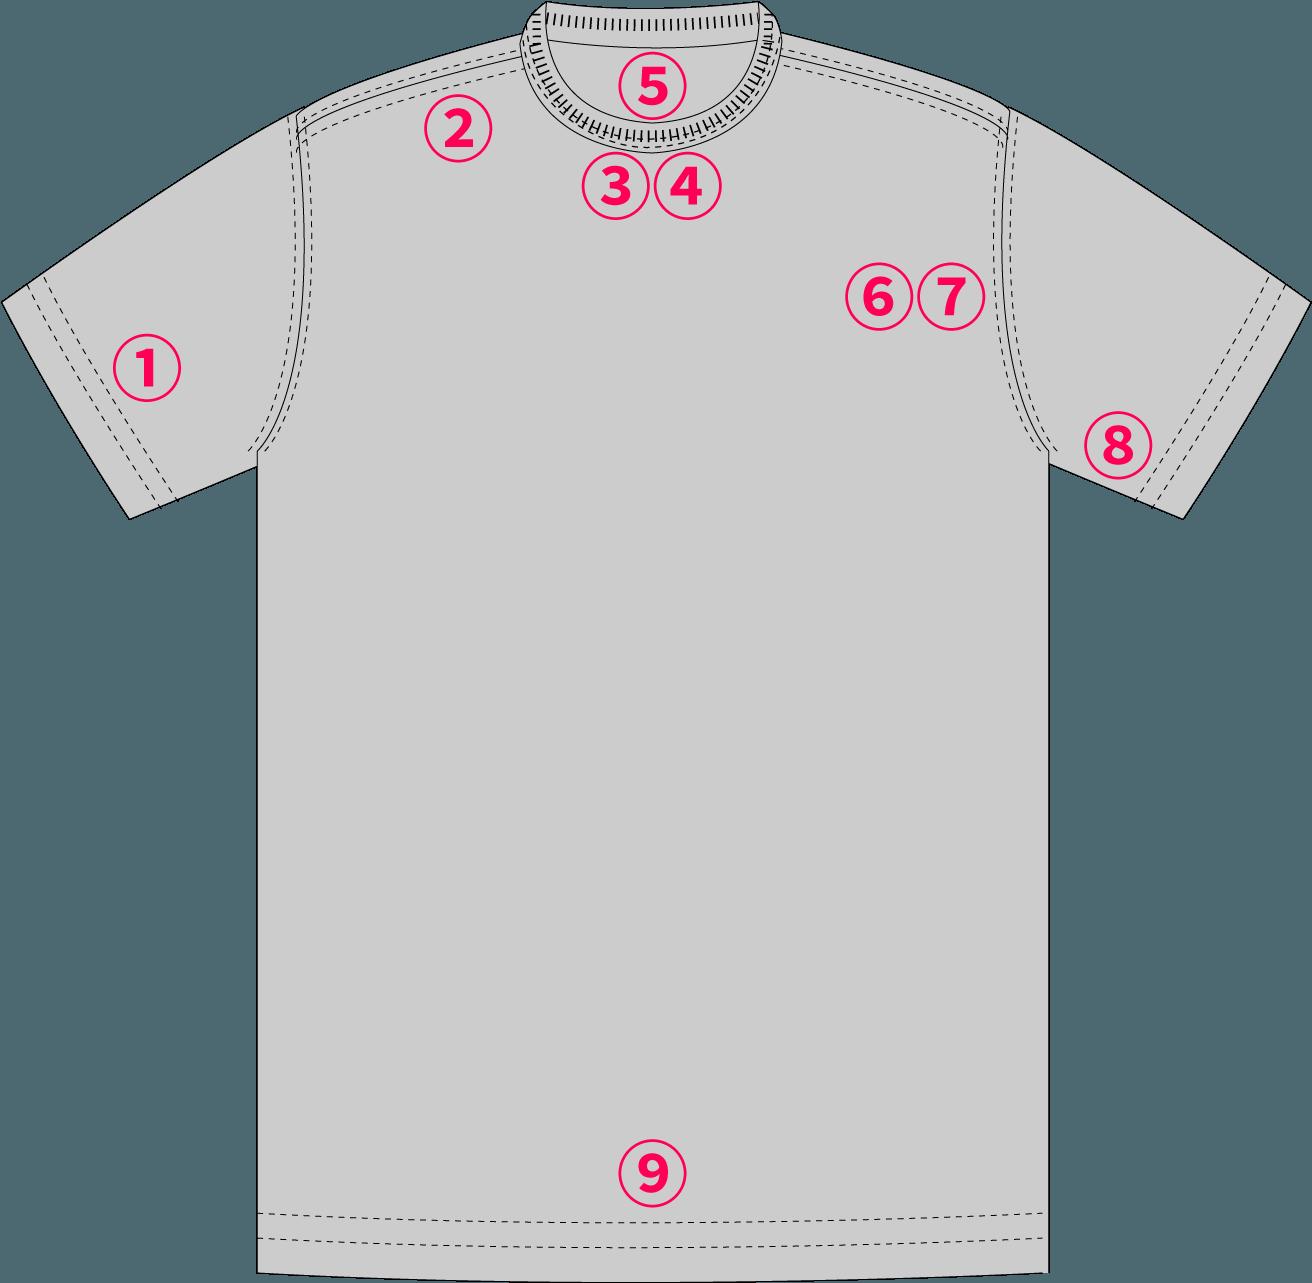 Garment_Tshirt_2_NumFull@3x-8.png